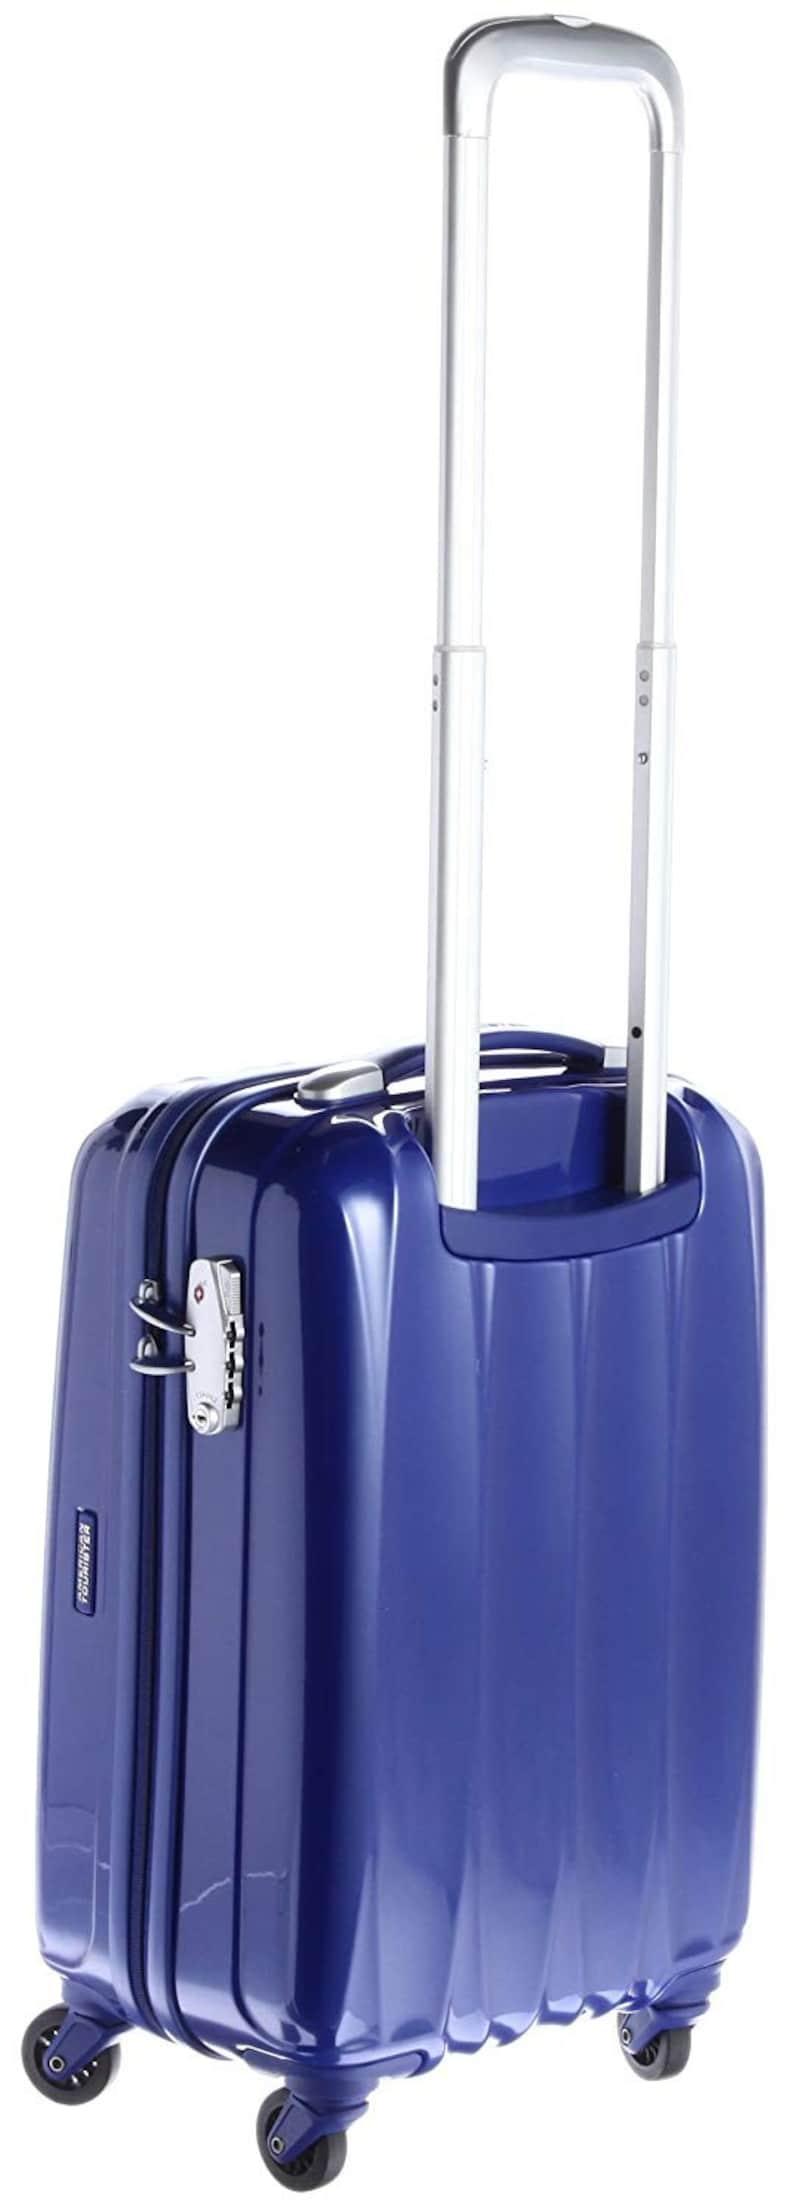 American Tourister(アメリカンツーリスター),キャリーケース アローナ スピナー55 ブルー,56531